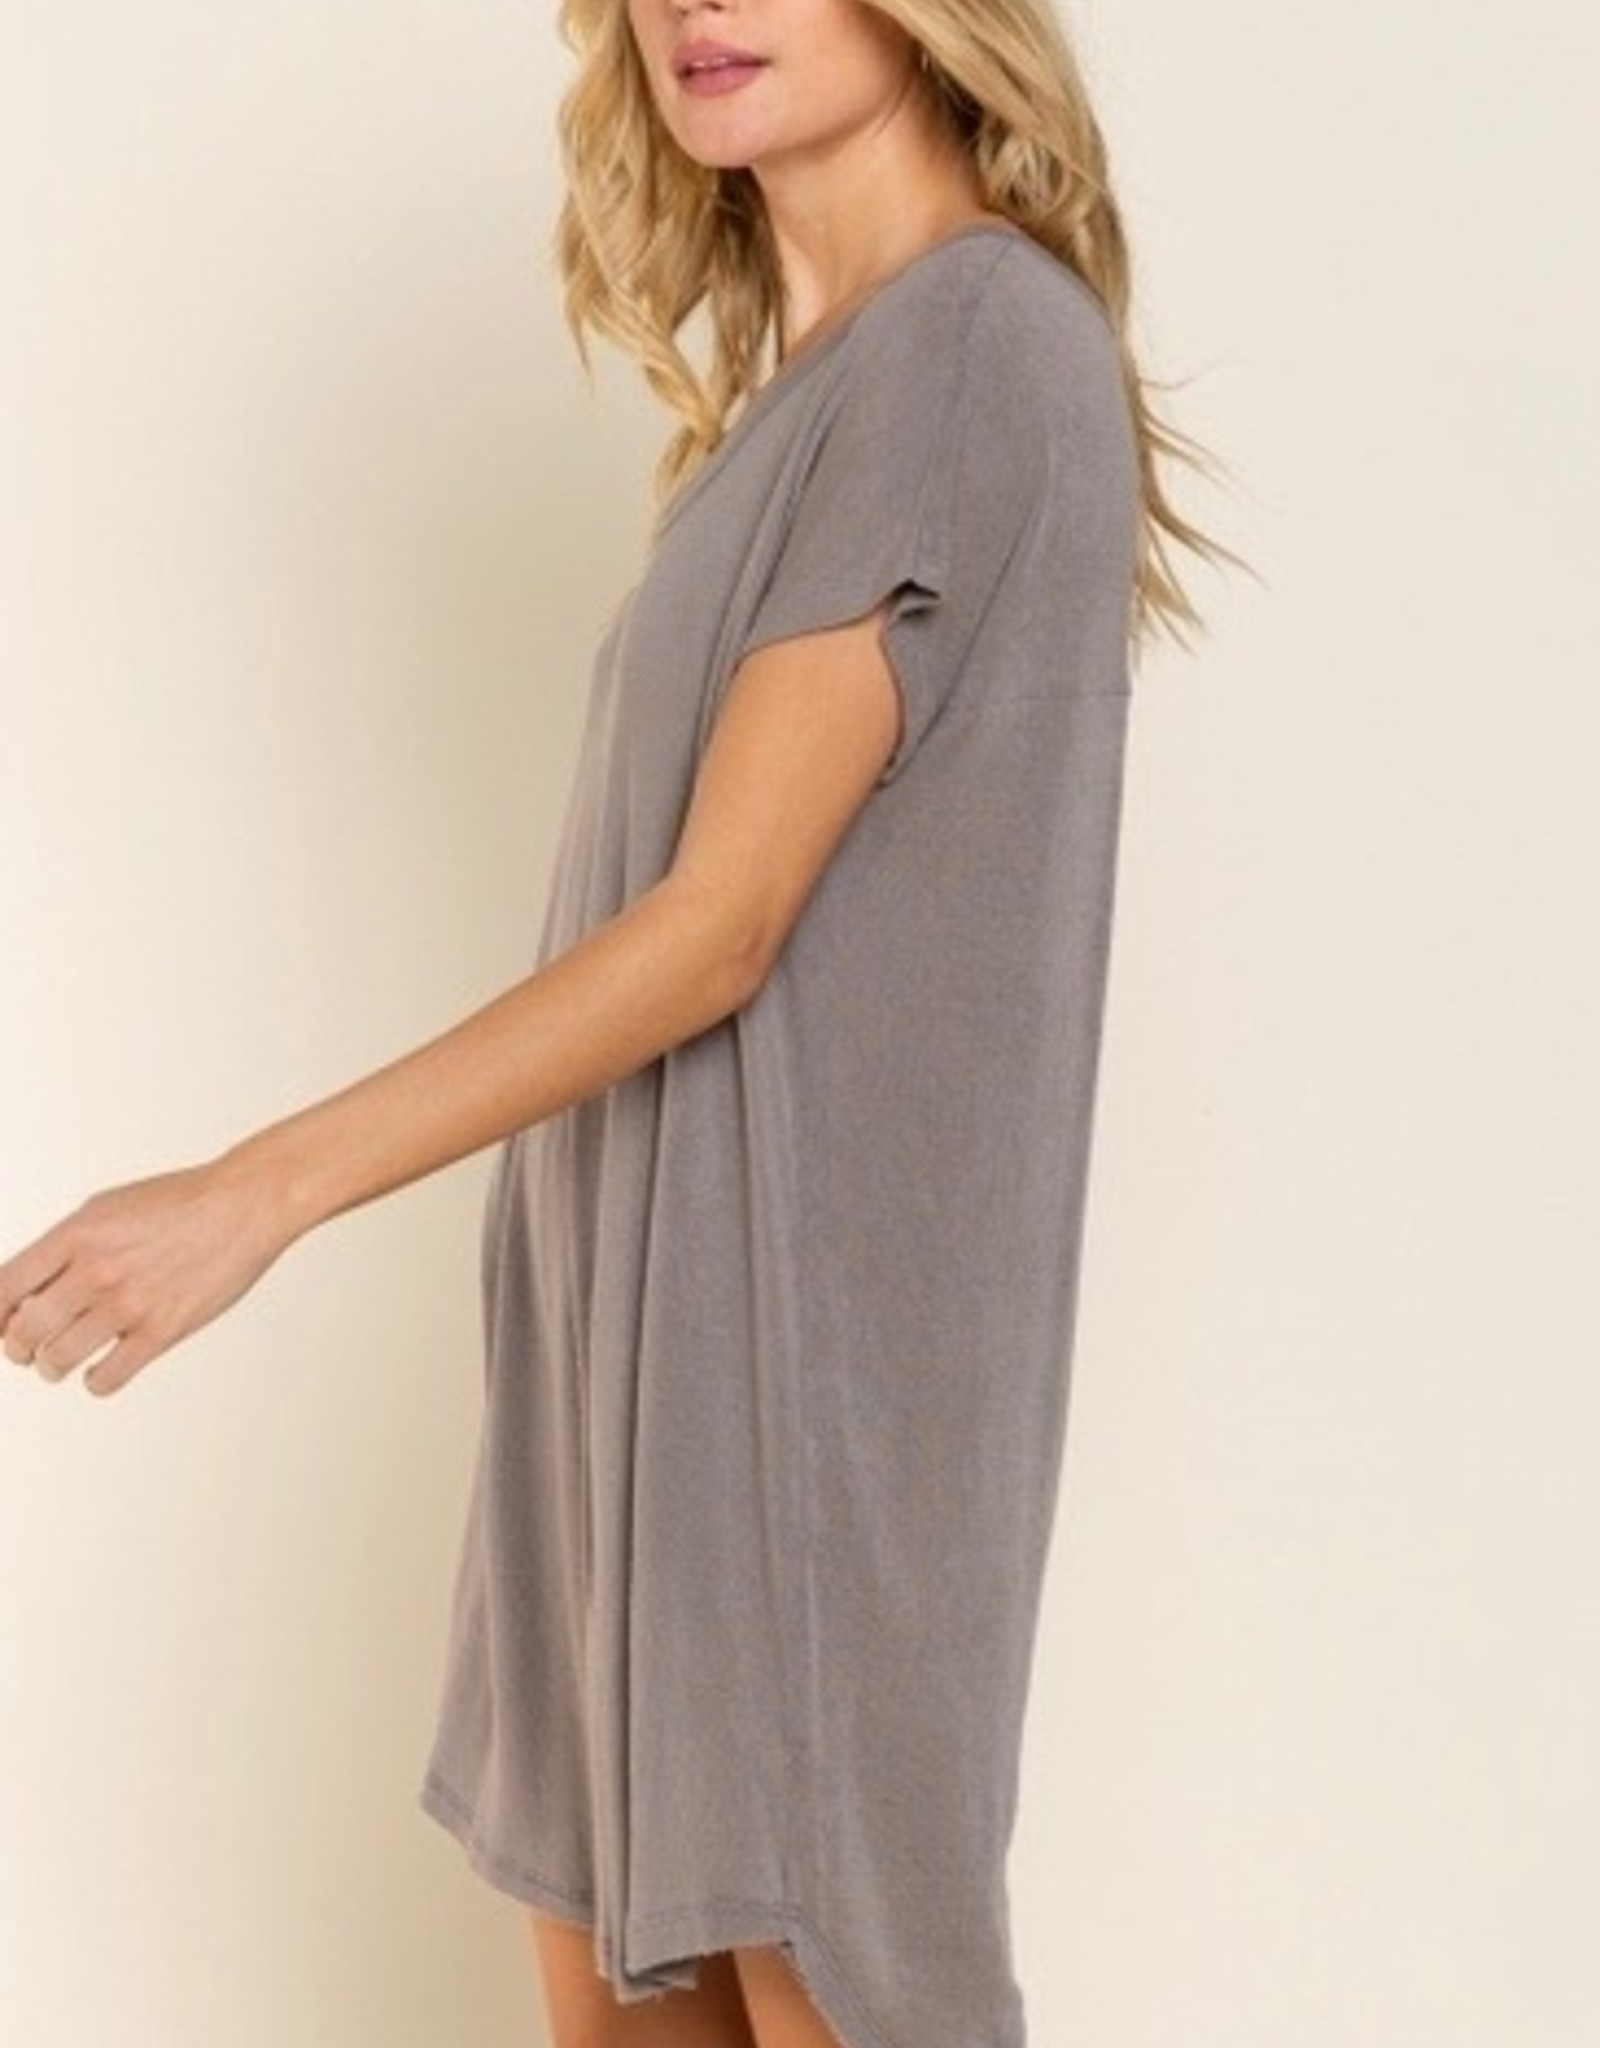 Pol Clothing SMD124 Dress